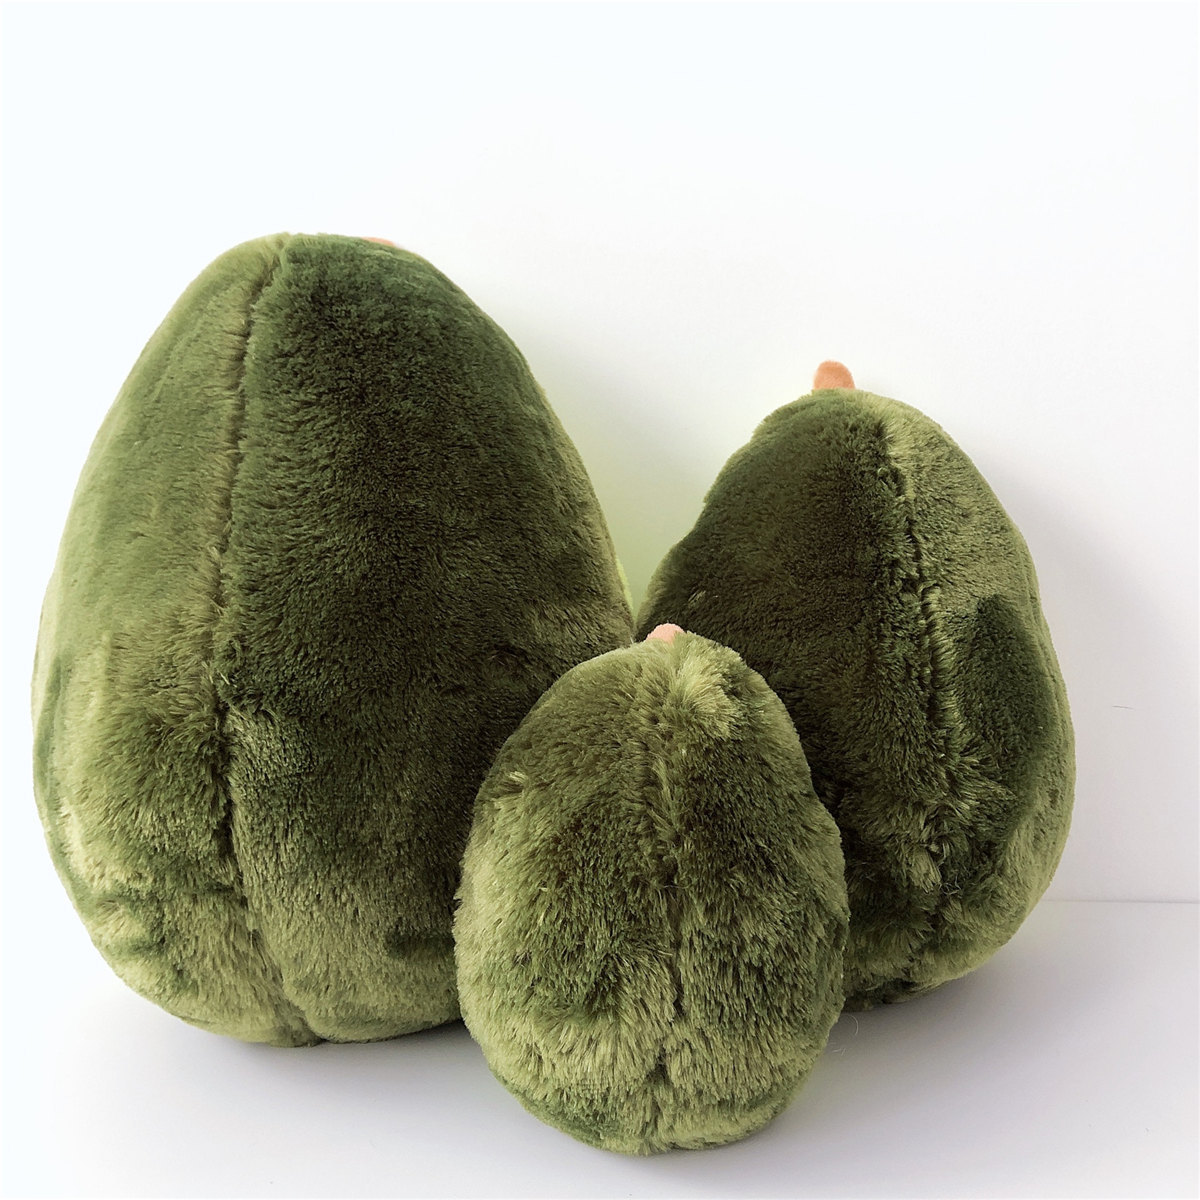 New Plush Avocado Stuffed Plush Toy Filled Doll Cushion Pillow Child Child Christmas Gift Toys